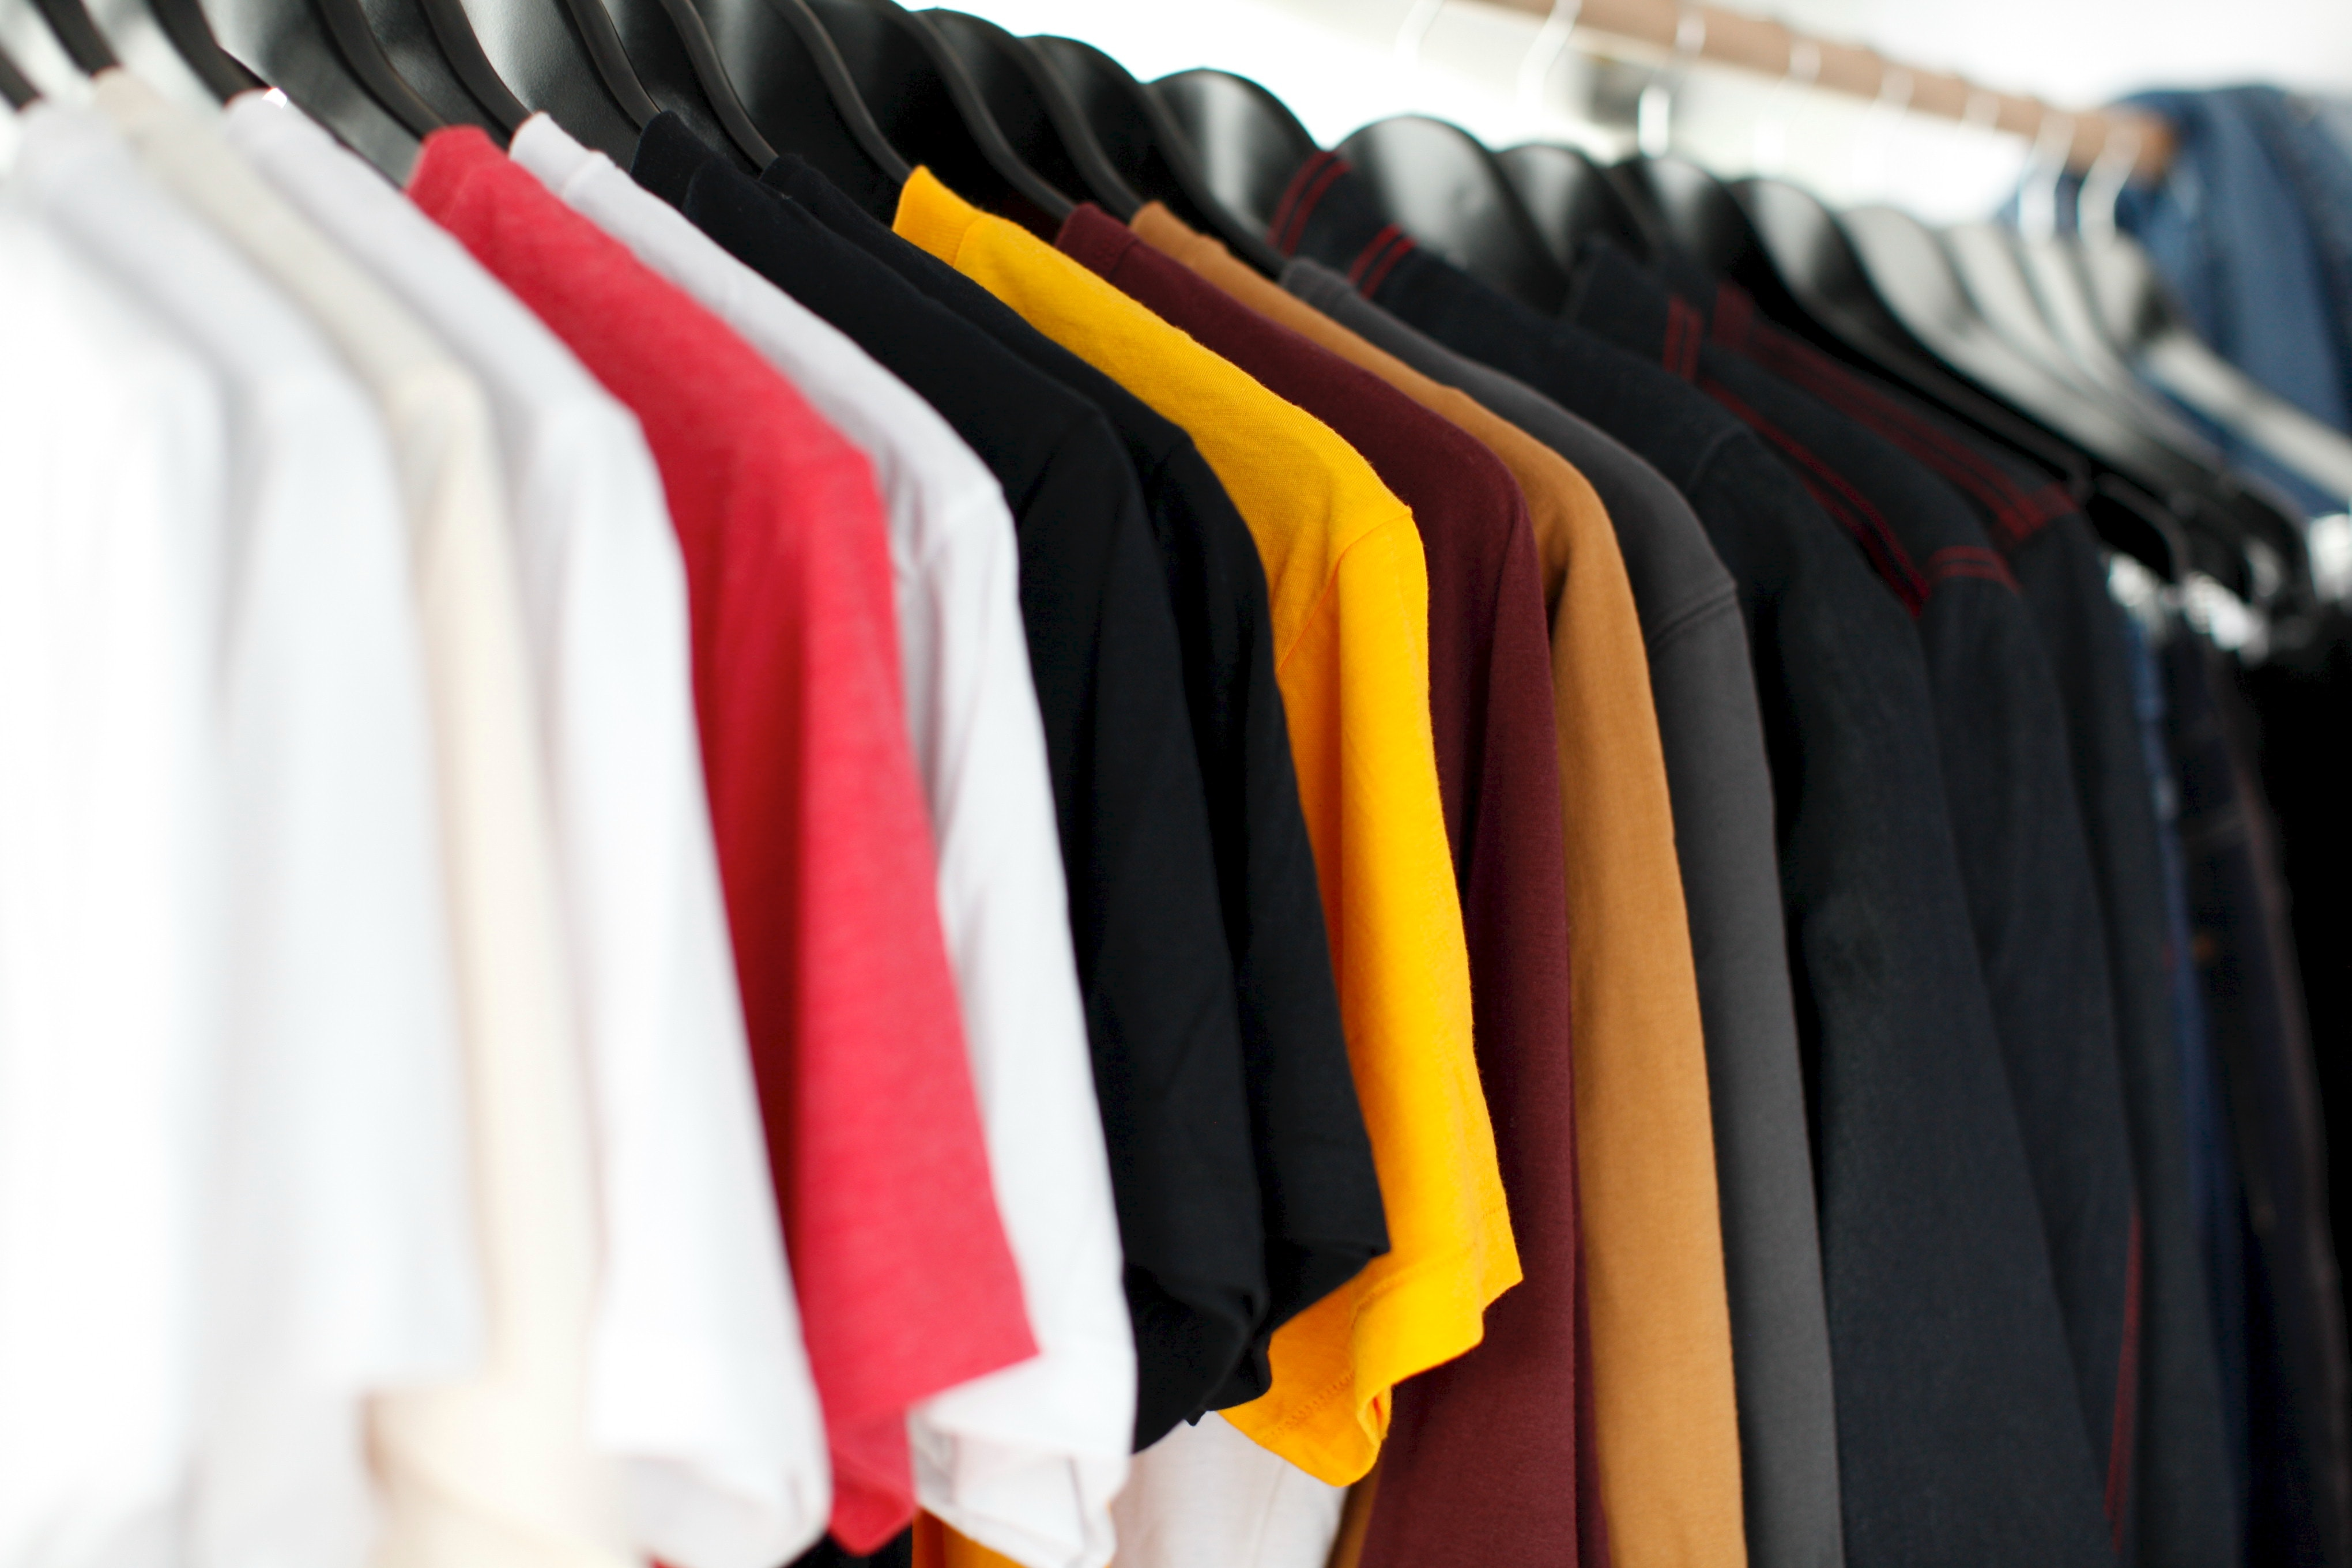 Rack of T shirts